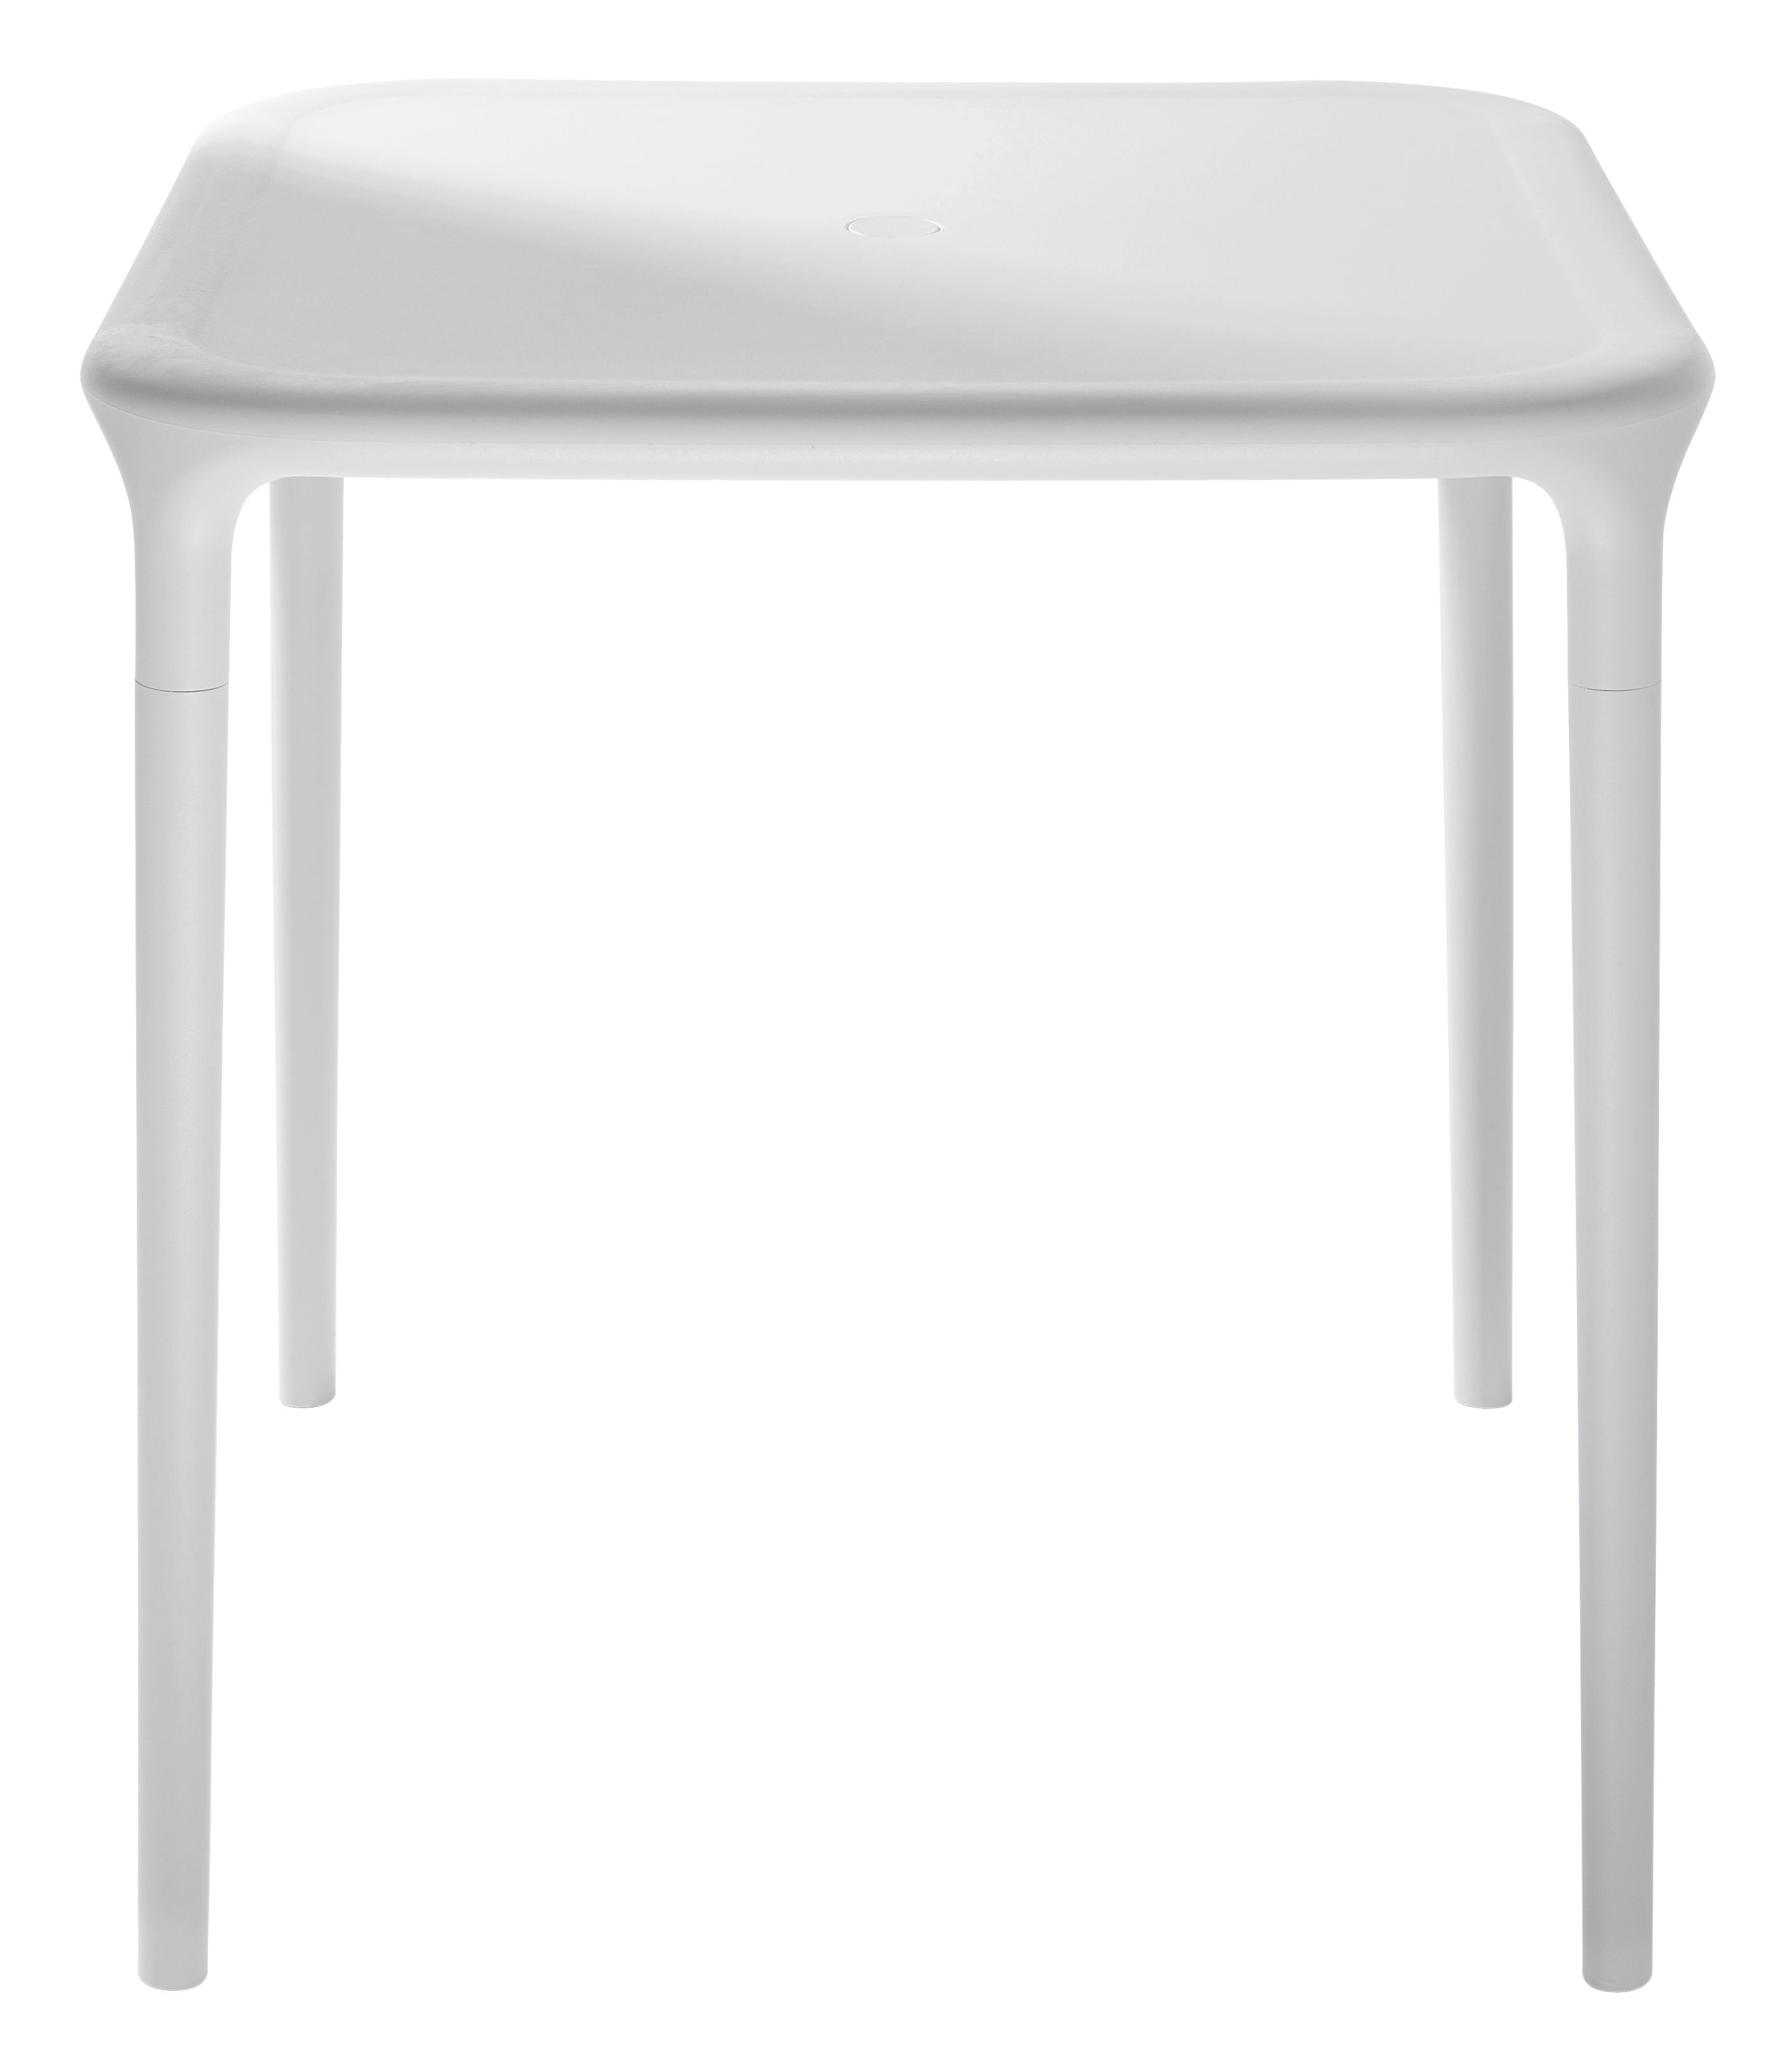 Air Table Garden table White 65 x 65 cm by Magis